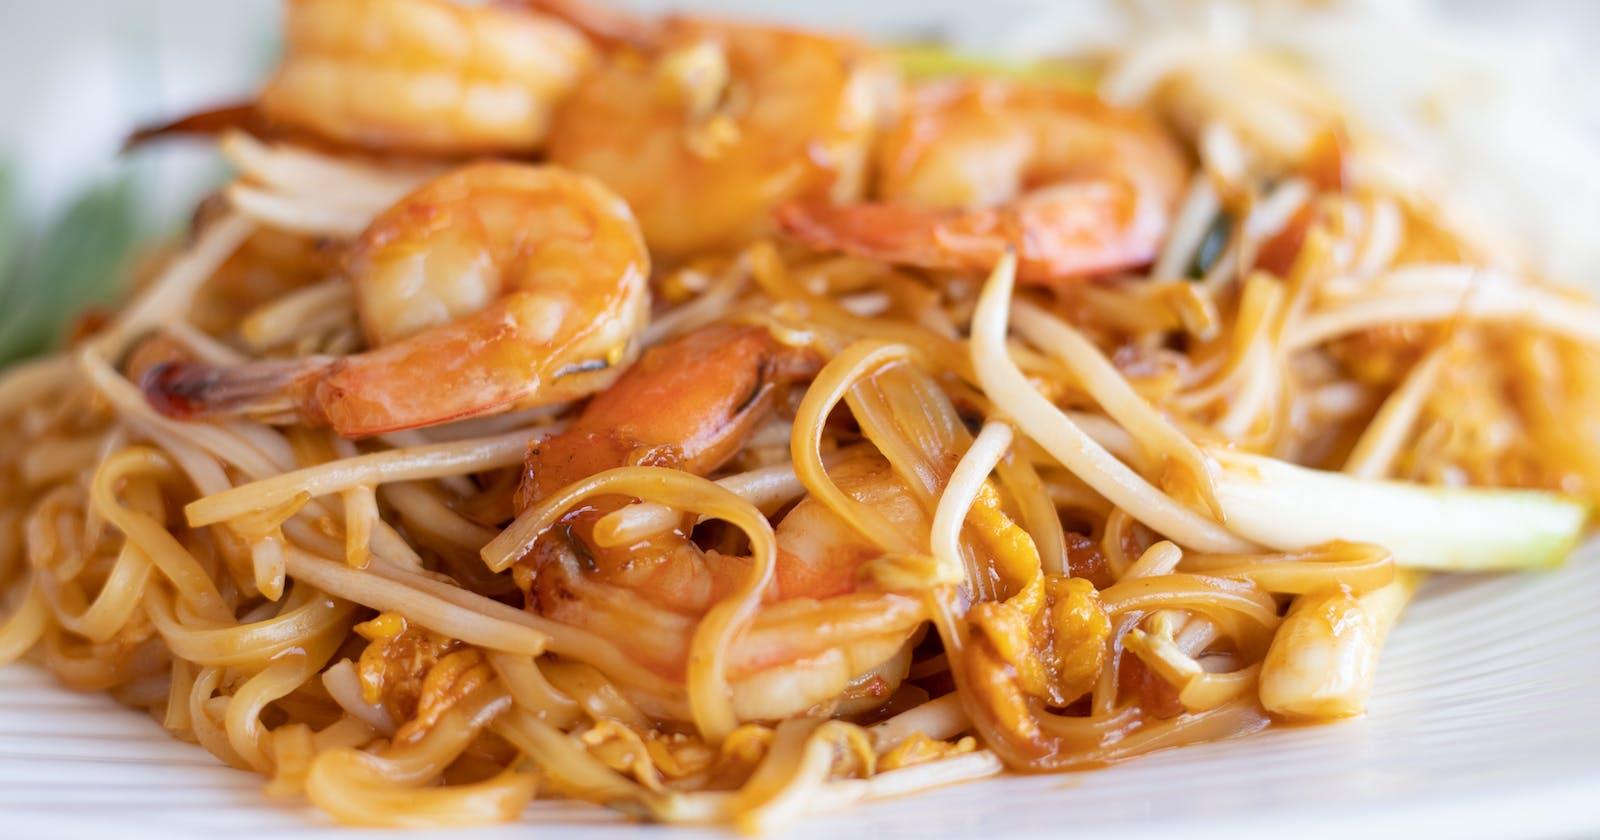 Using Python to Scrape Thai Food Data